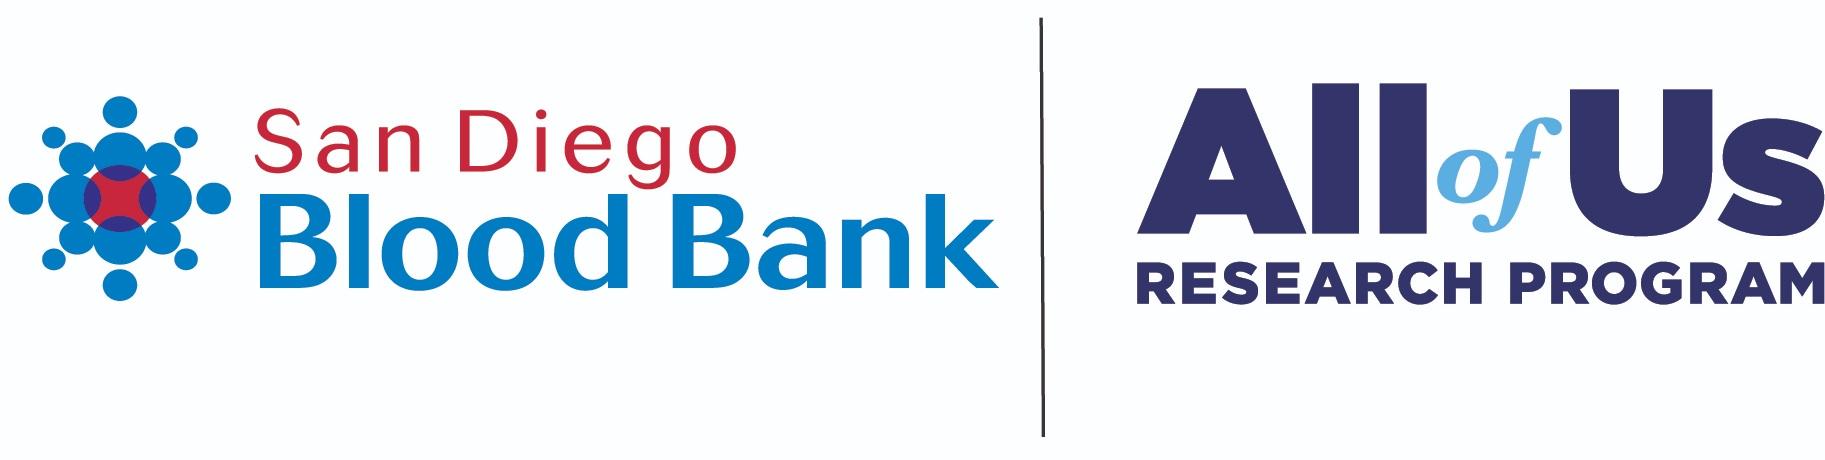 SDBB_AOU+logo+together_.jpg